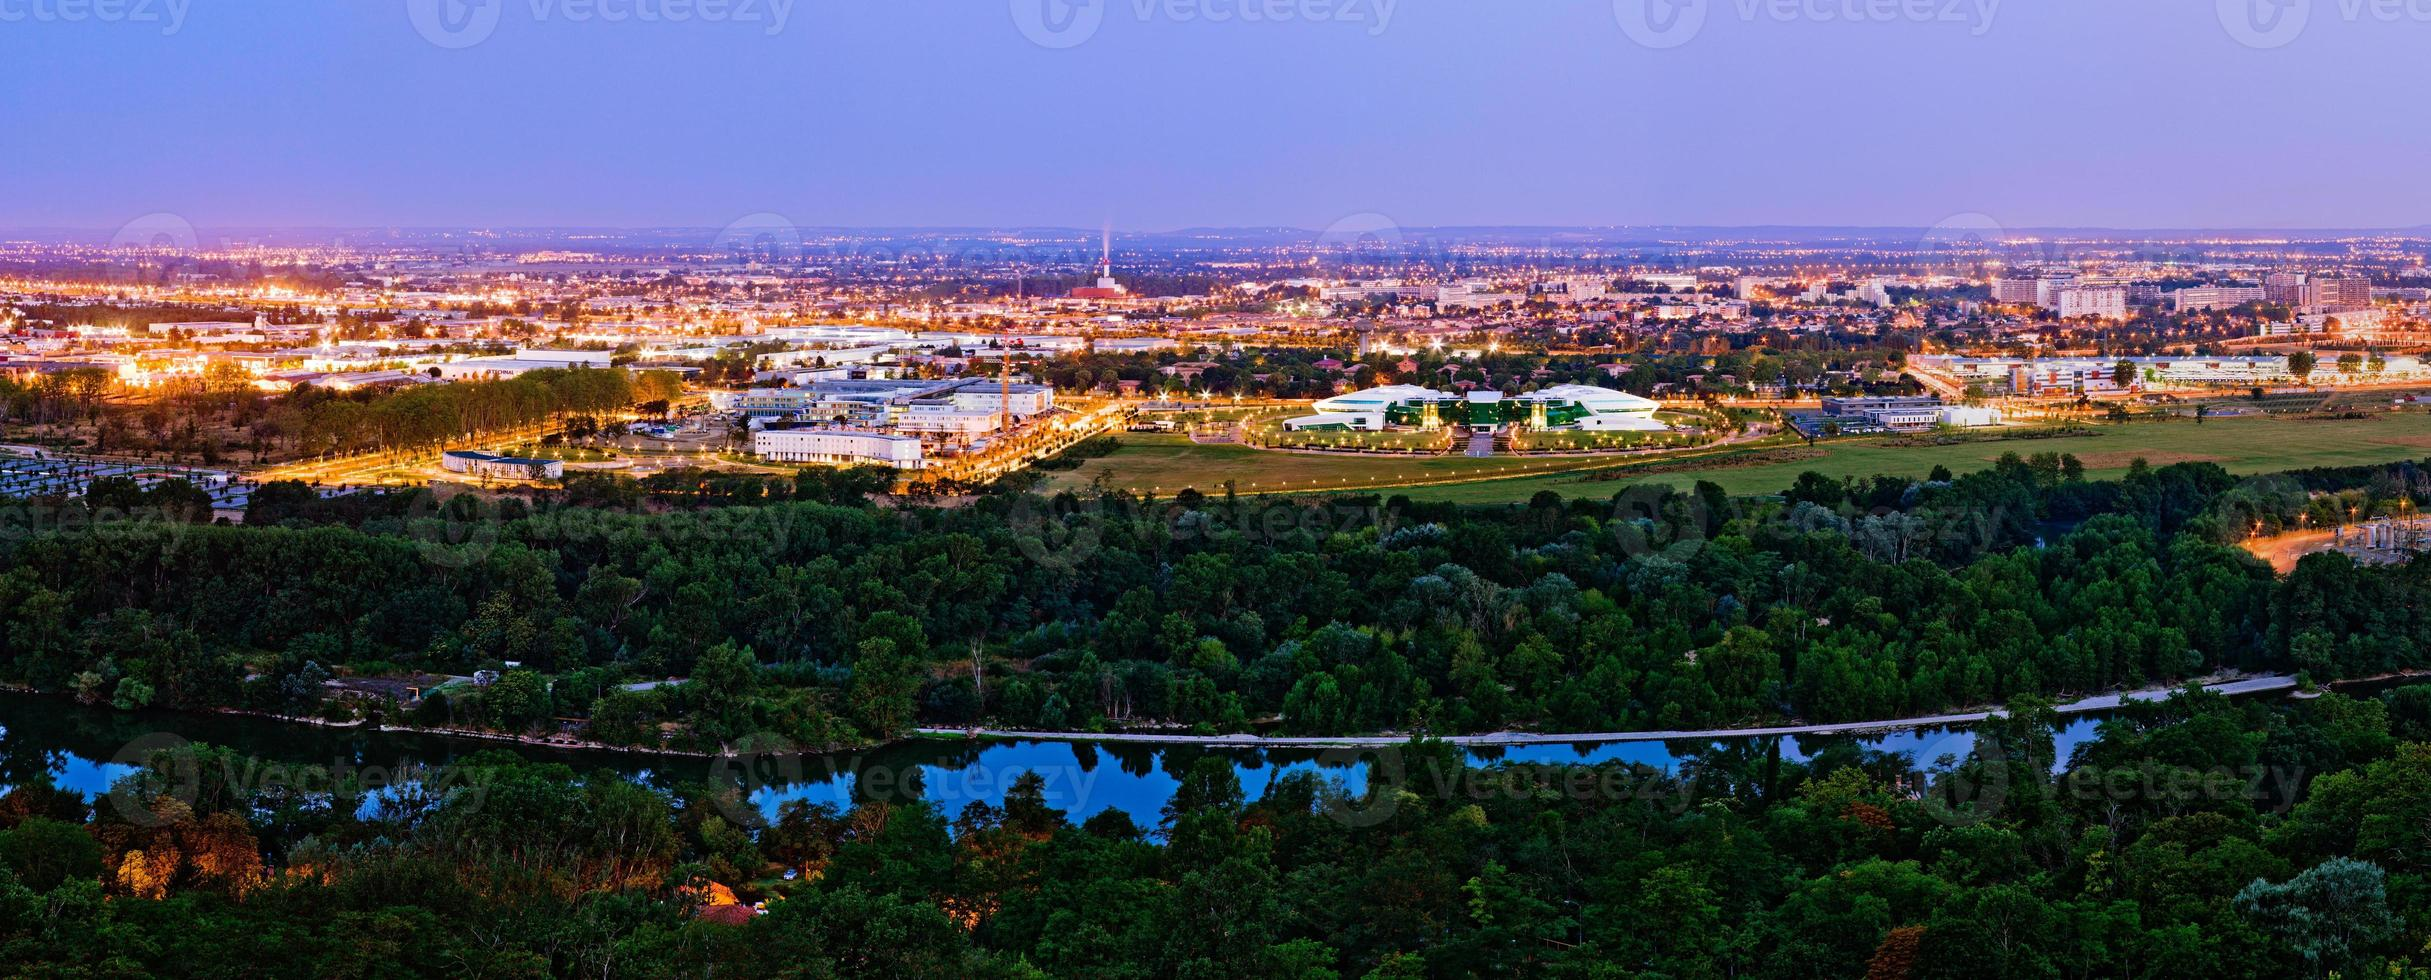 Sunrise view on Canceropole, Toulouse, France photo